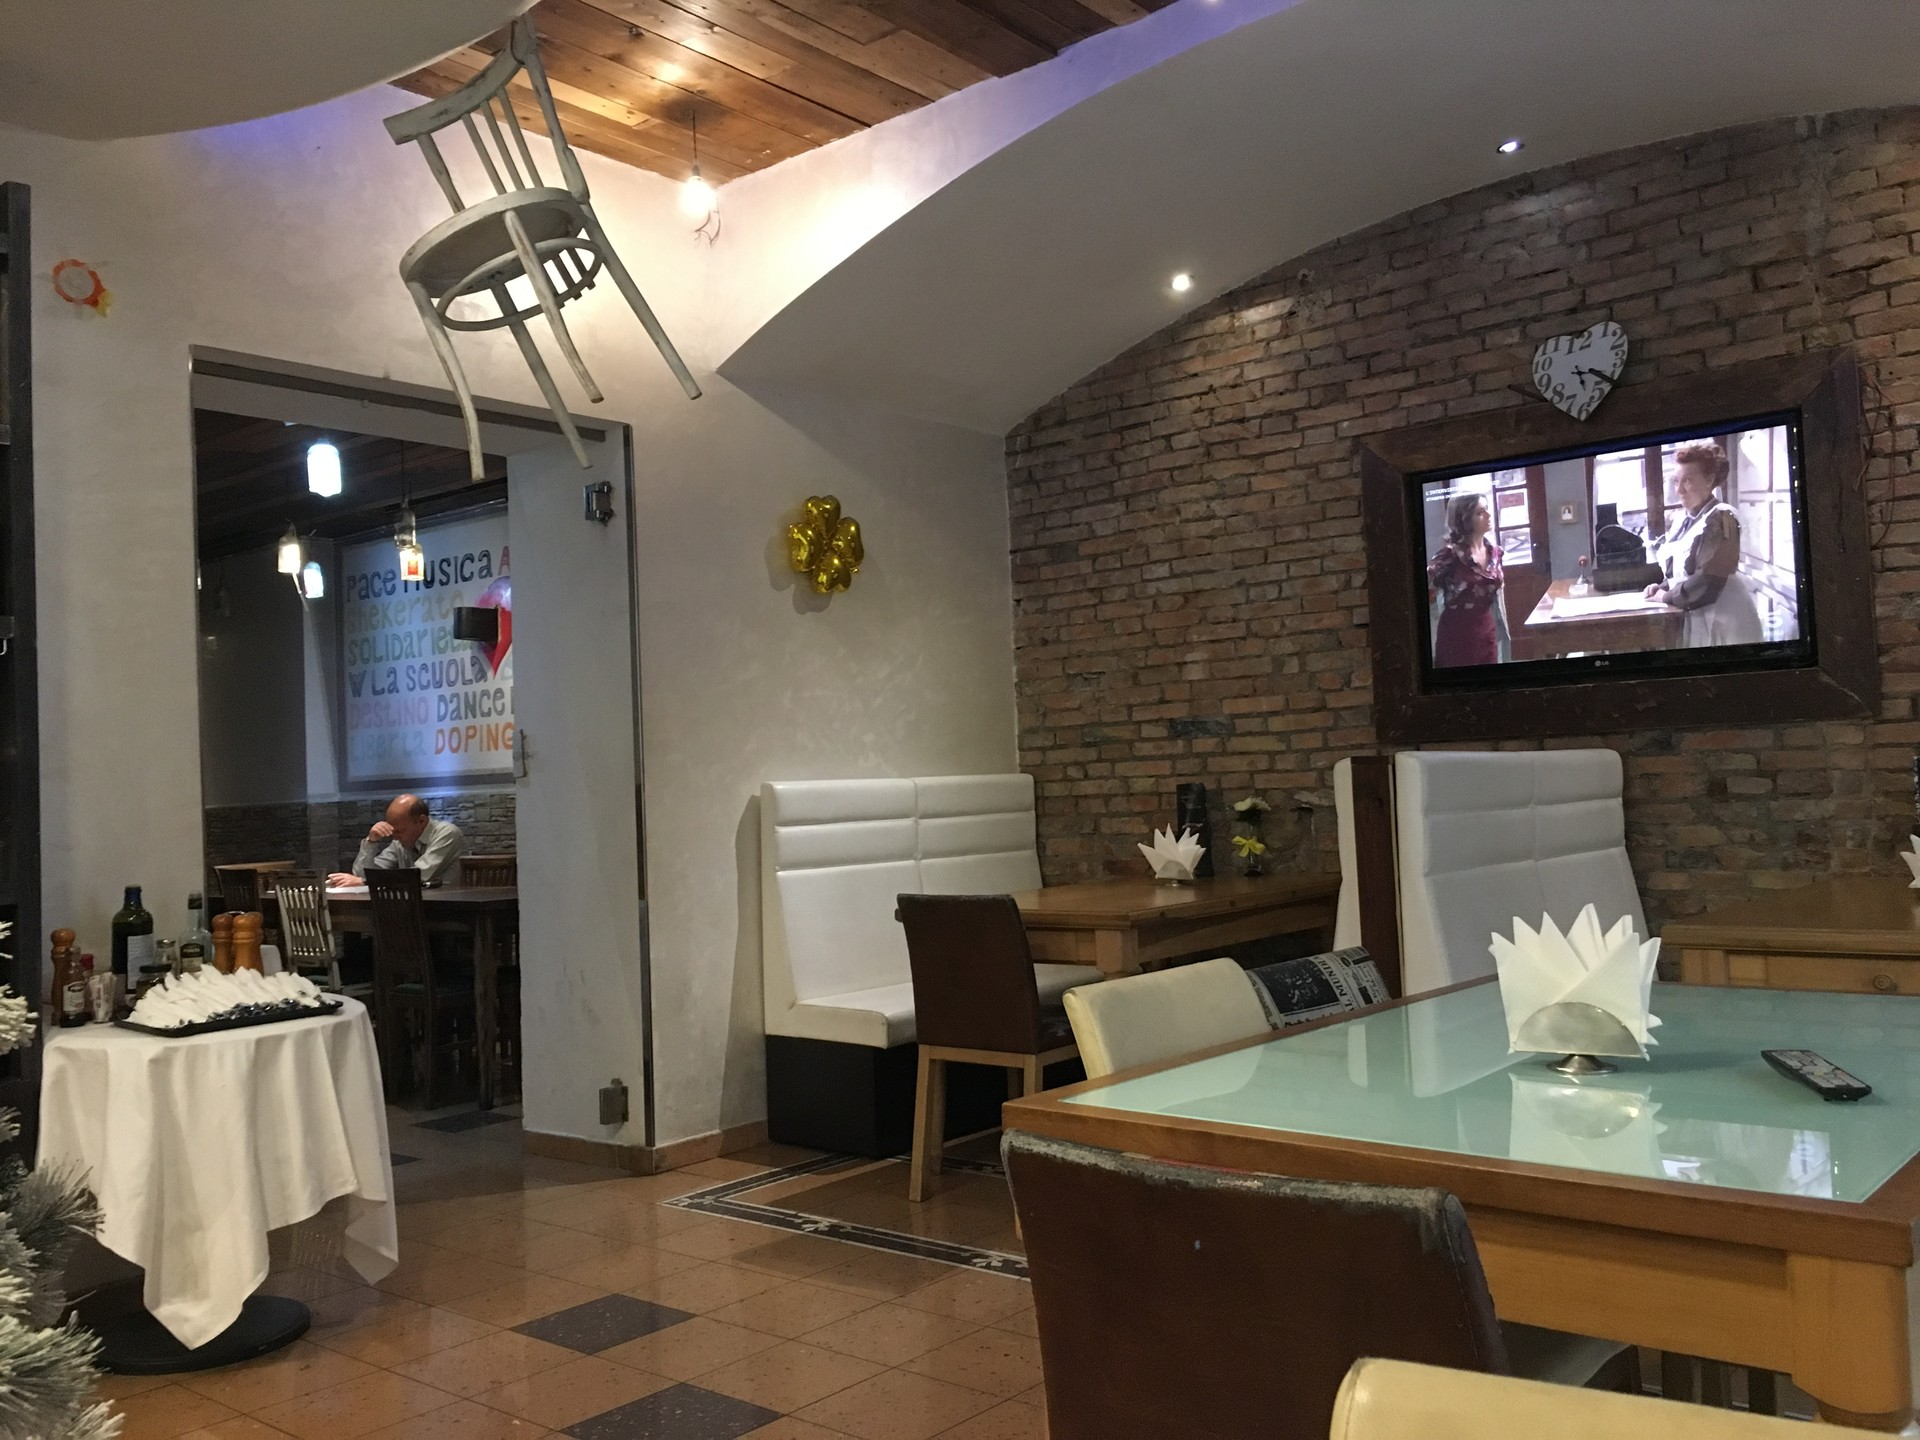 cafeteriarestaurante-c14455a33dd1dffdf0d